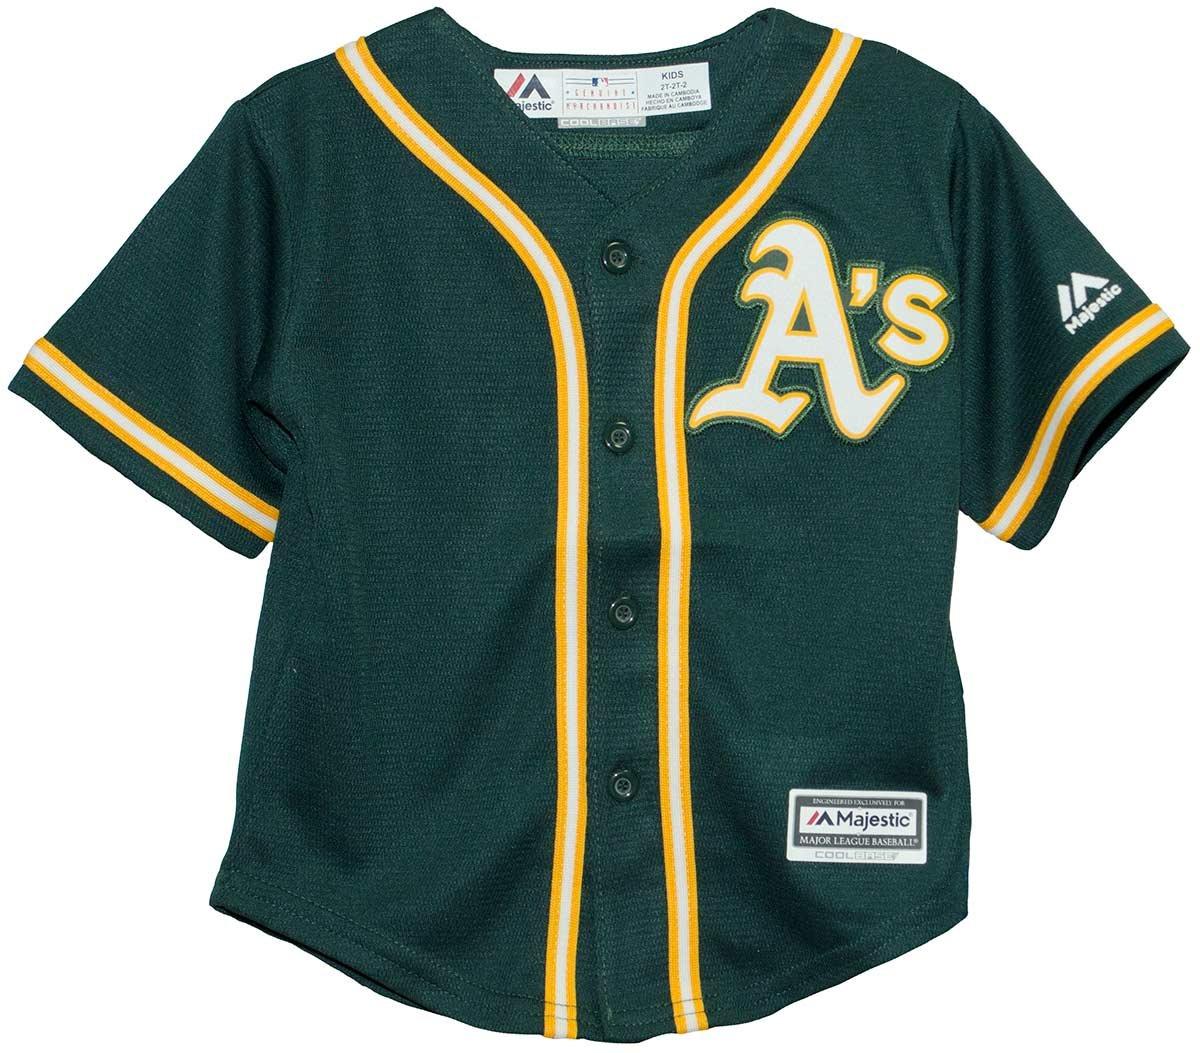 separation shoes 1adb2 b2acd Amazon.com : Oakland Athletics Green Cool Base Child Jersey ...